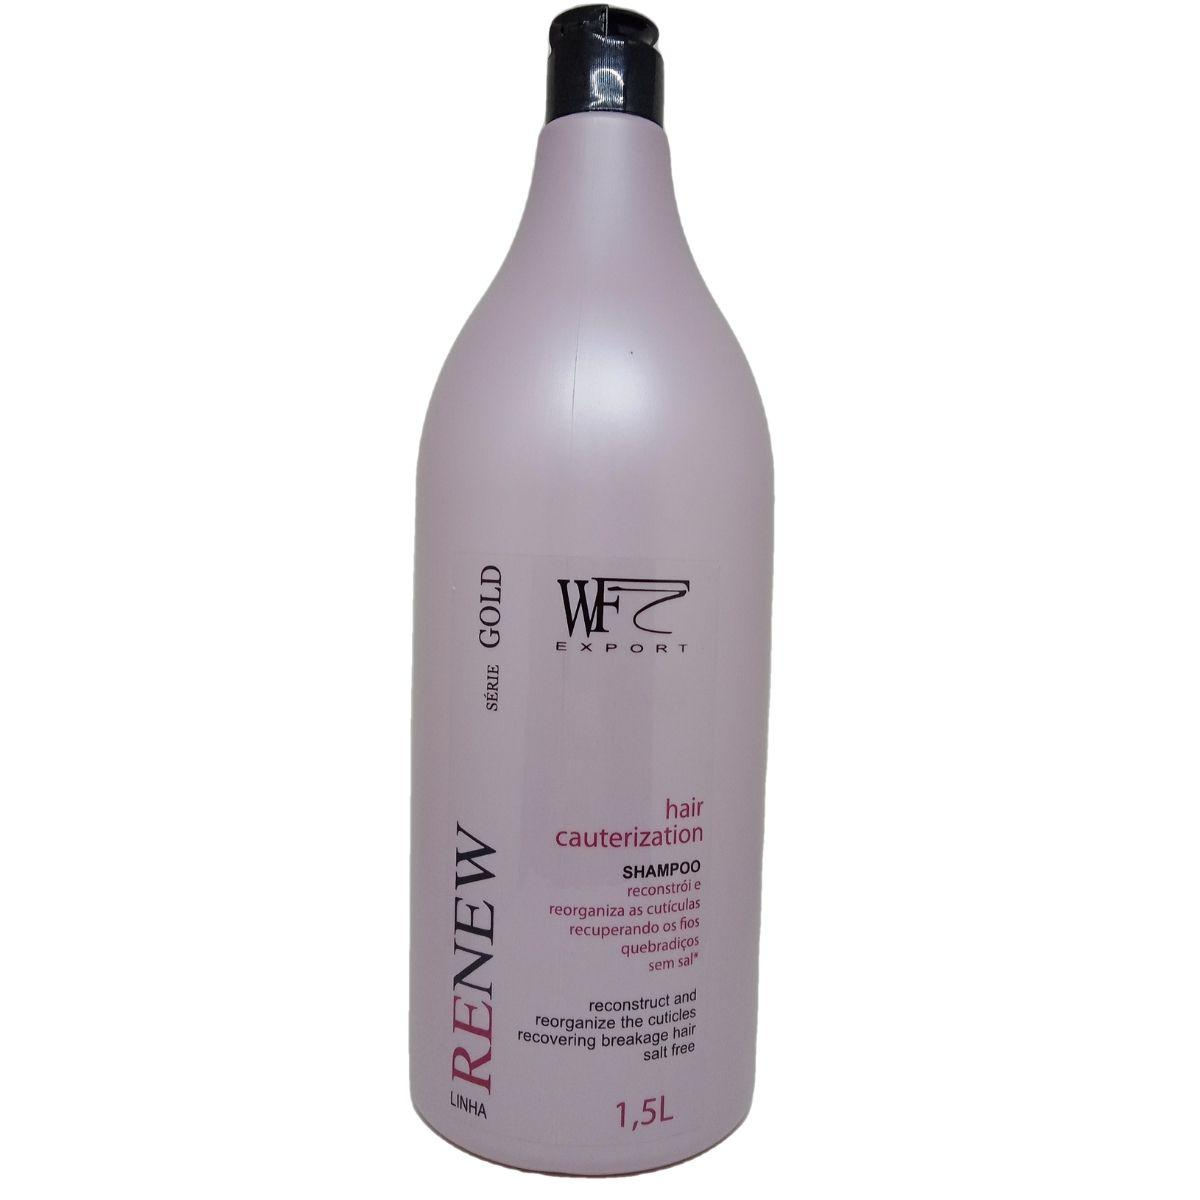 RENEW - SHAMPOO HAIR CAUTERIZATION WF COSMETICOS 1,5L